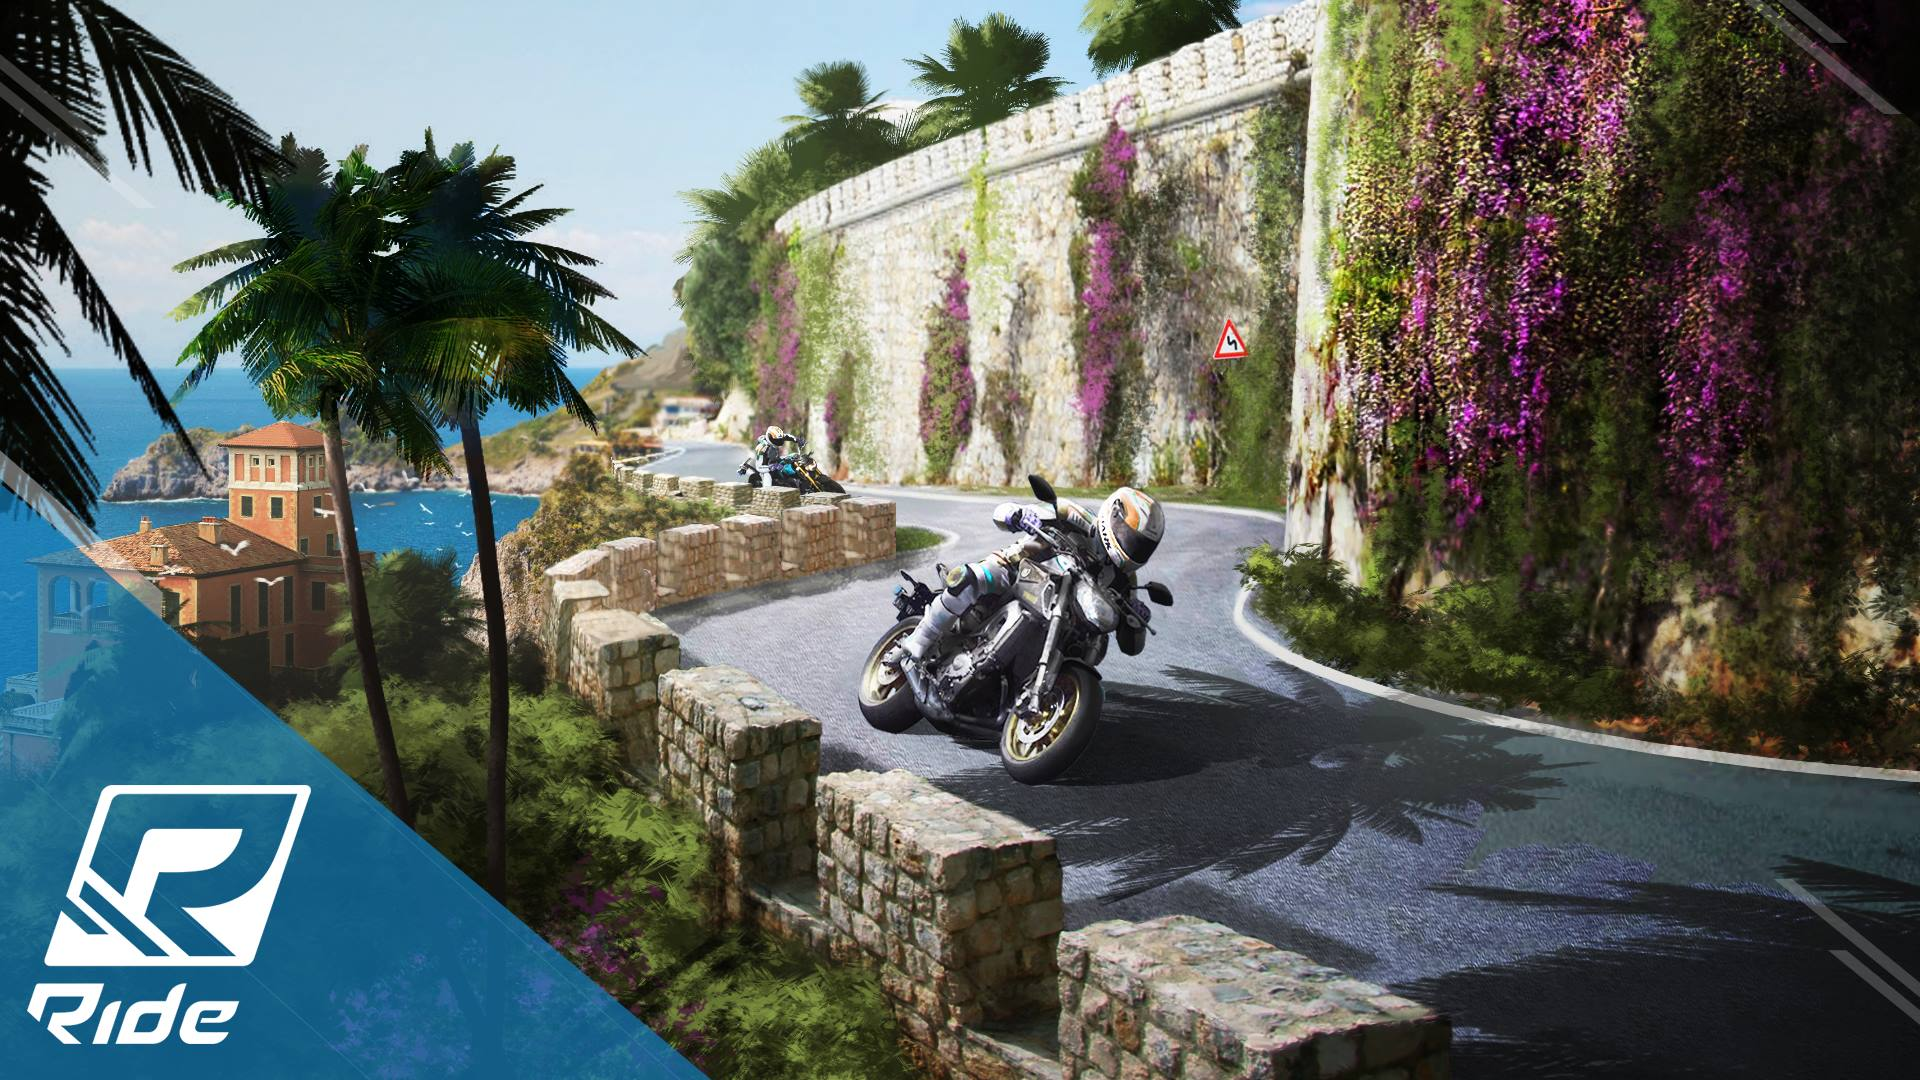 Ride French riviera artwork